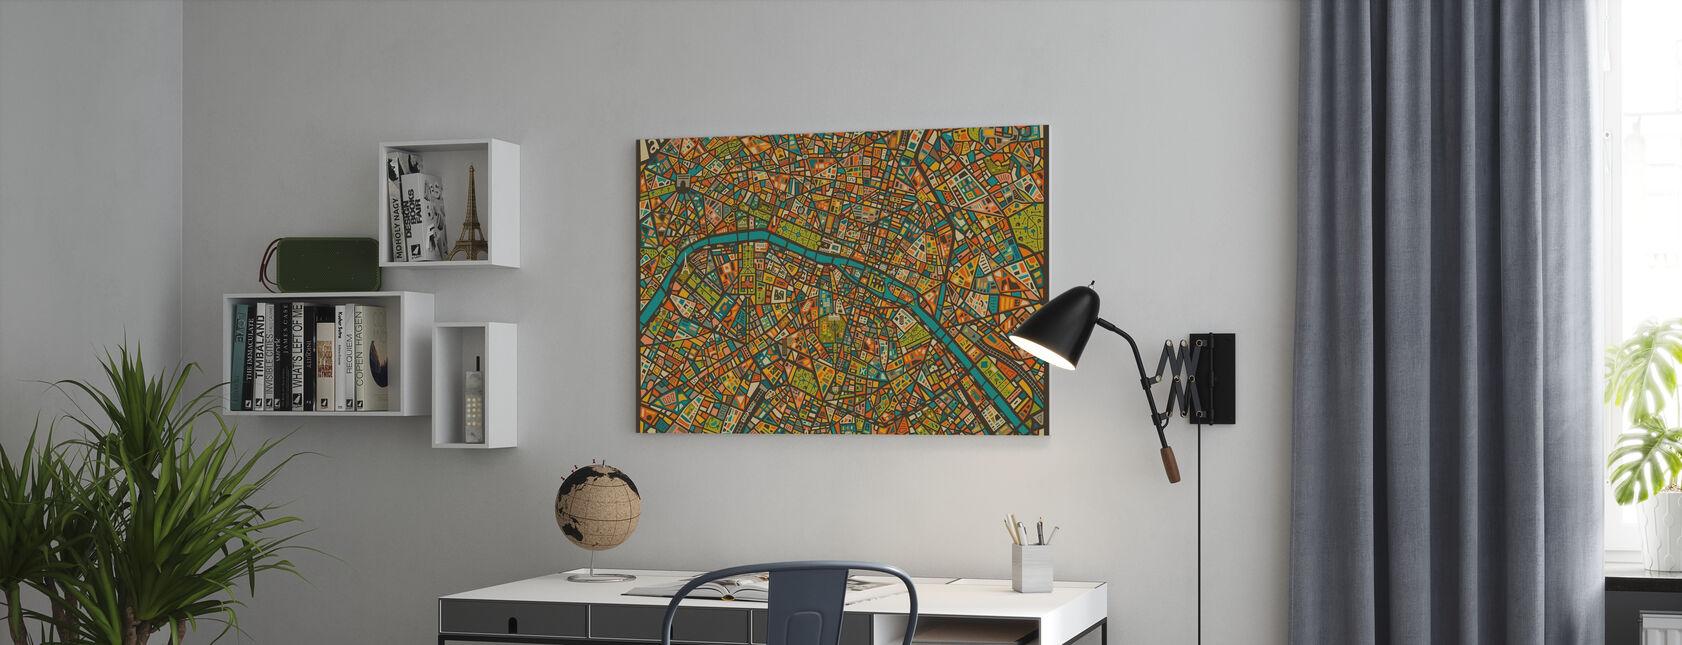 Mappa Paris Street - Stampa su tela - Uffici